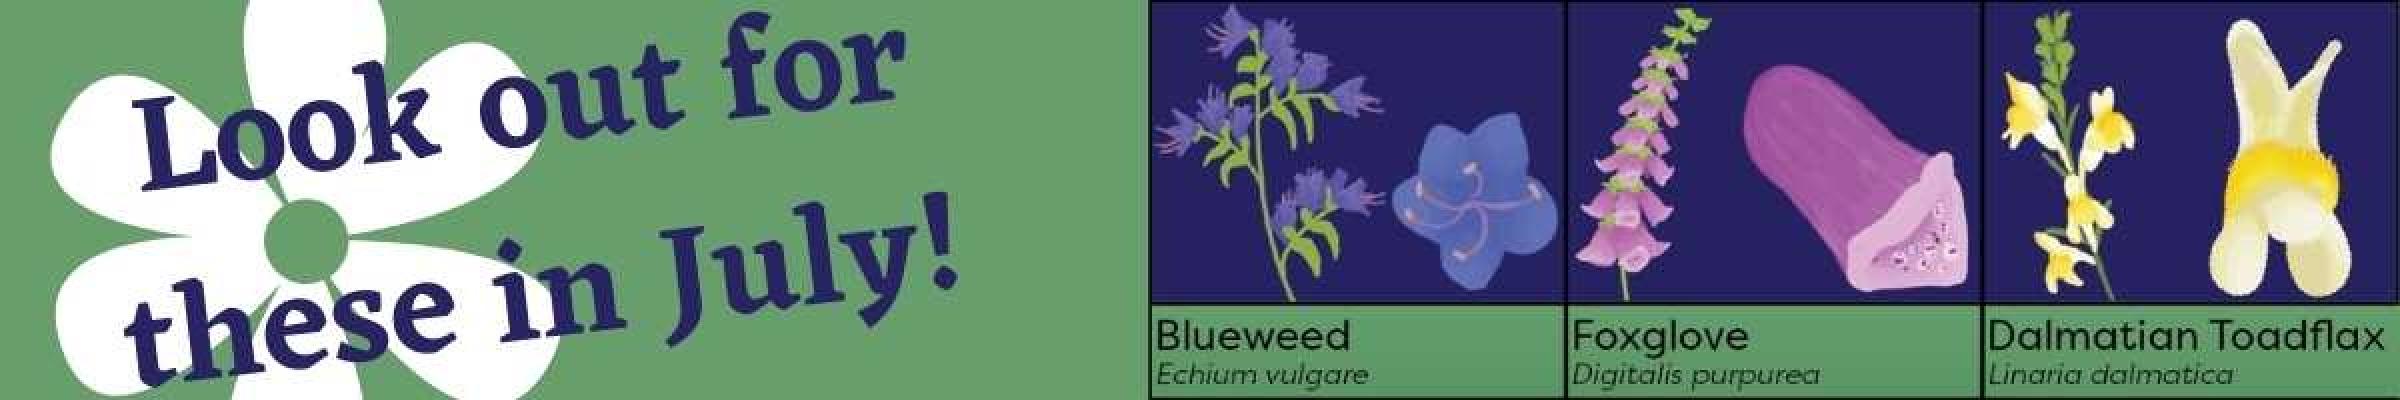 July Flowering Times website banner